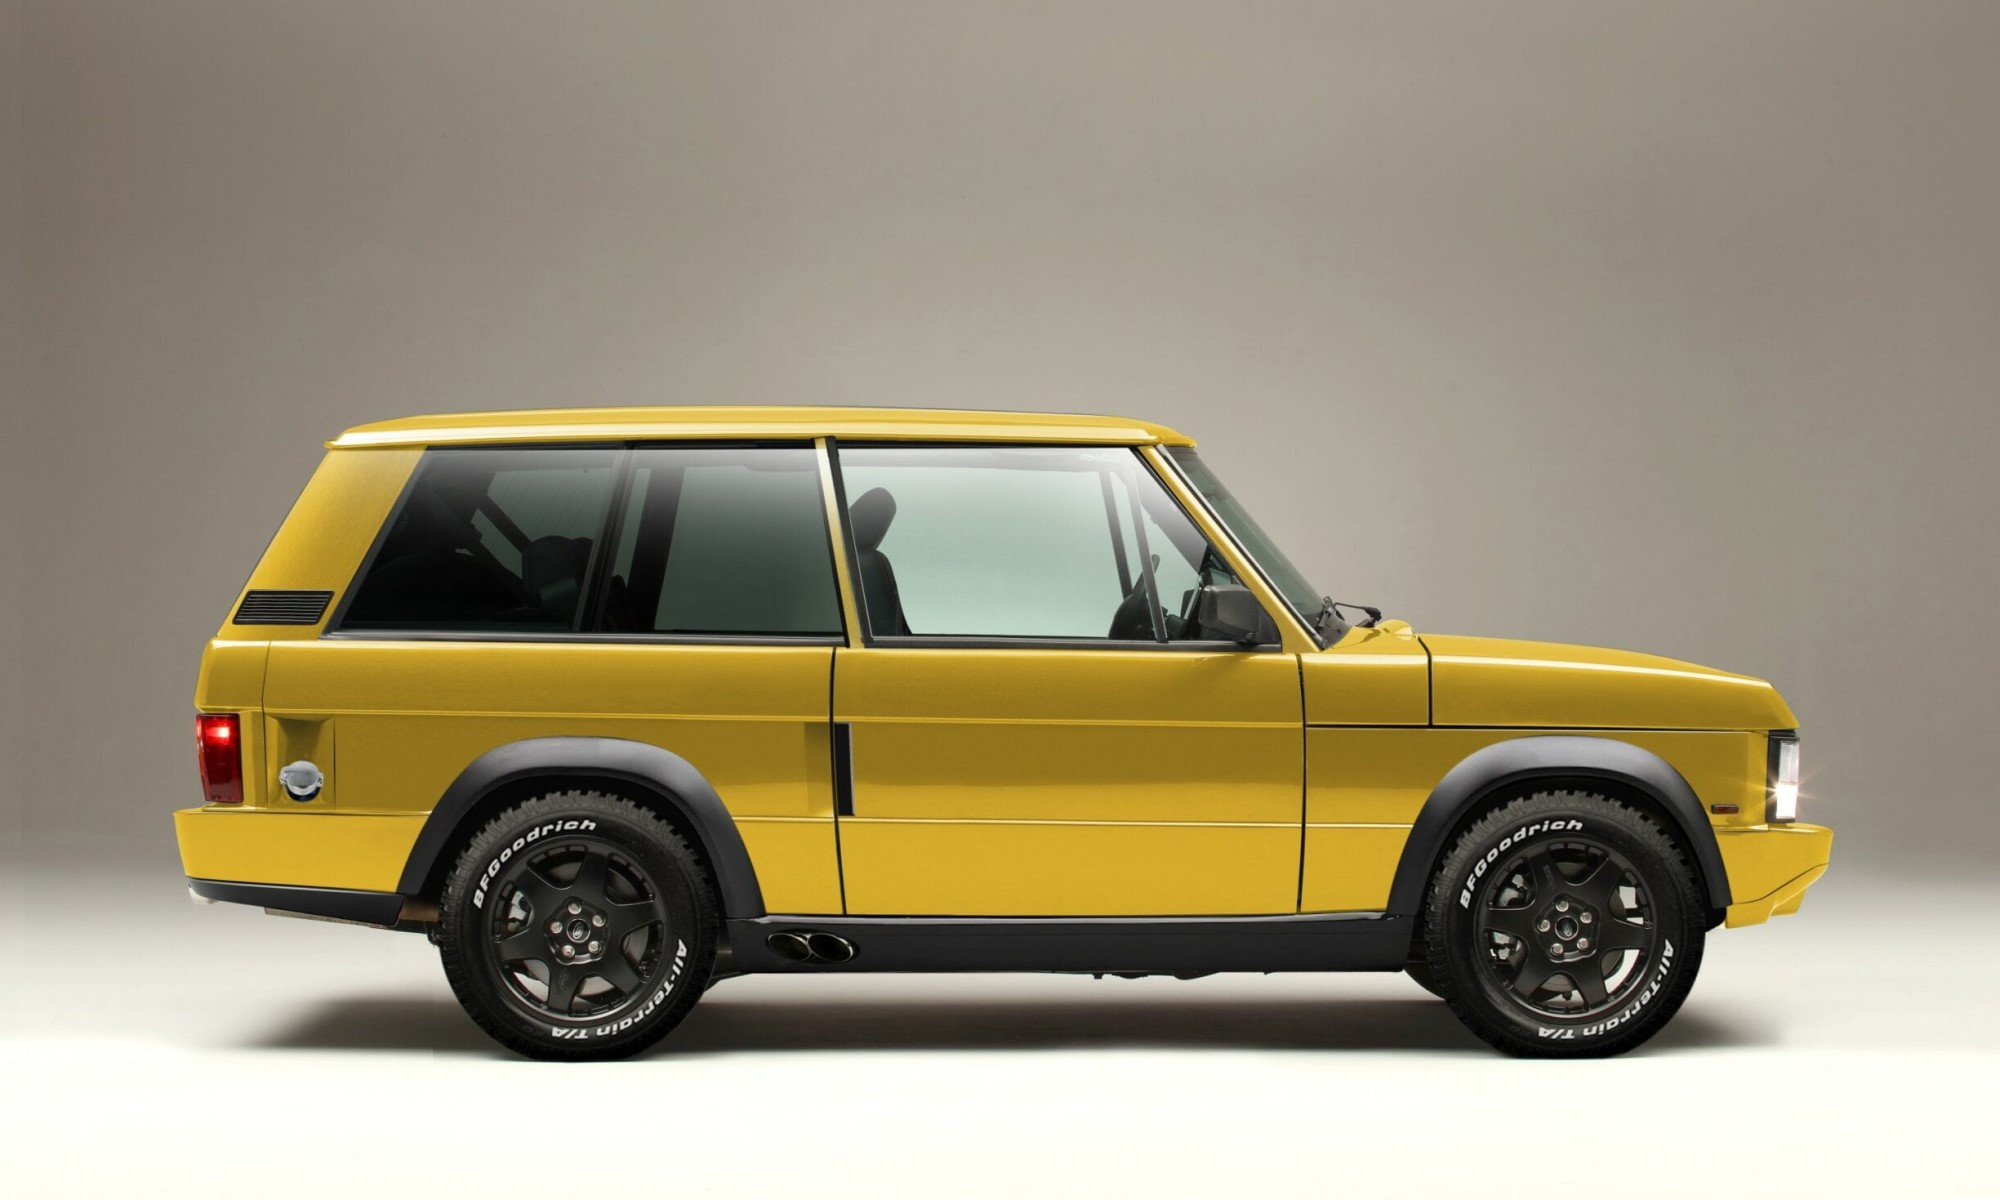 Chieftain Range Rover Classic profile